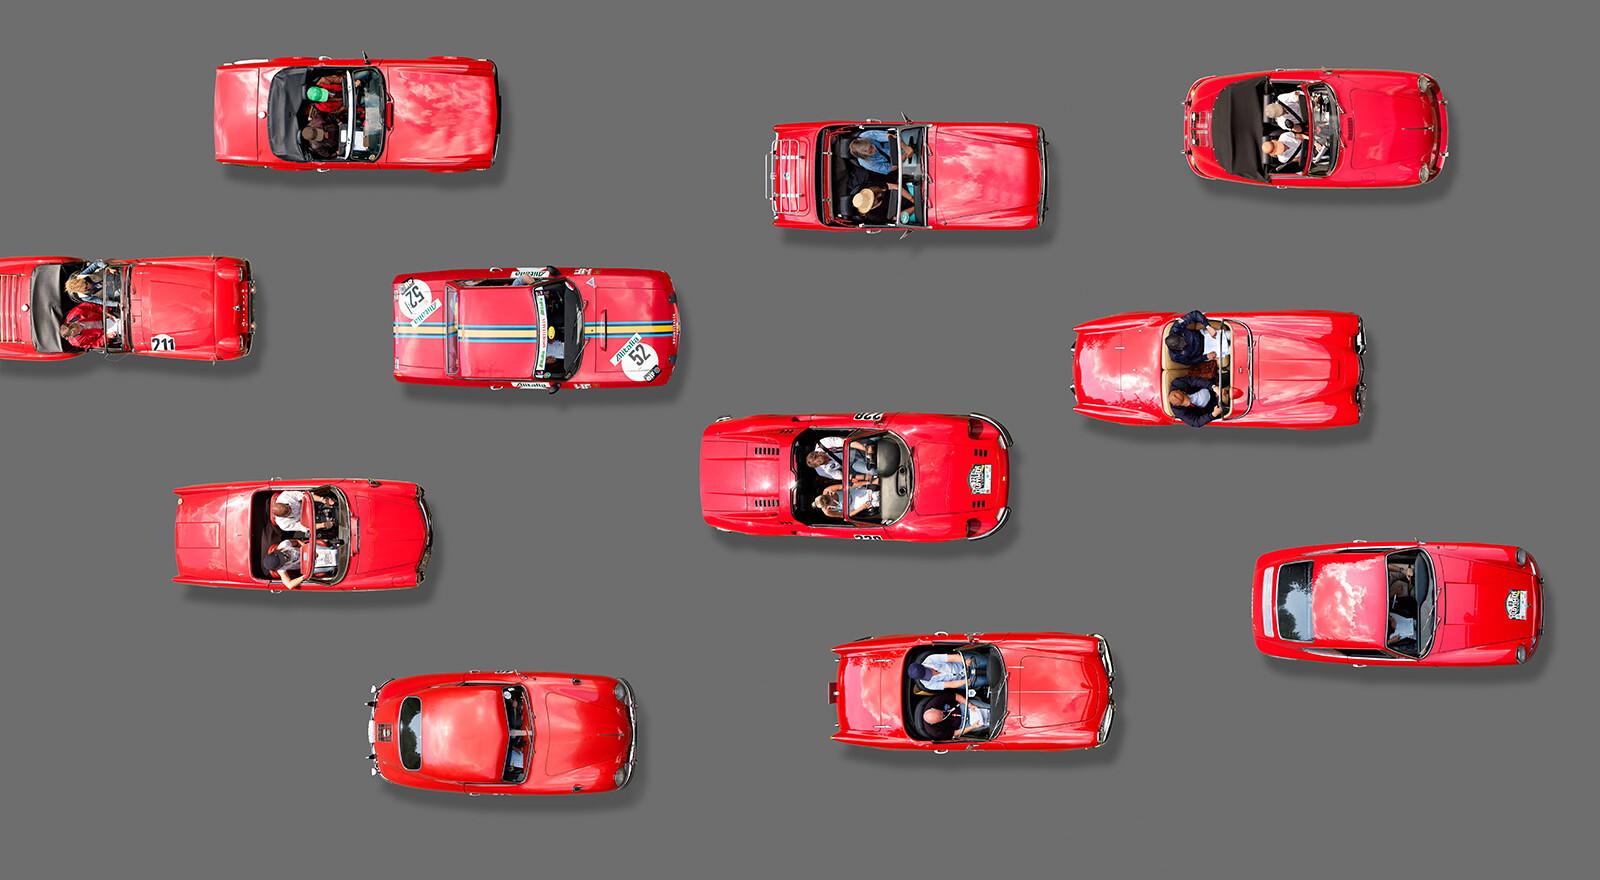 Red Cars - Bernhard Schmerl